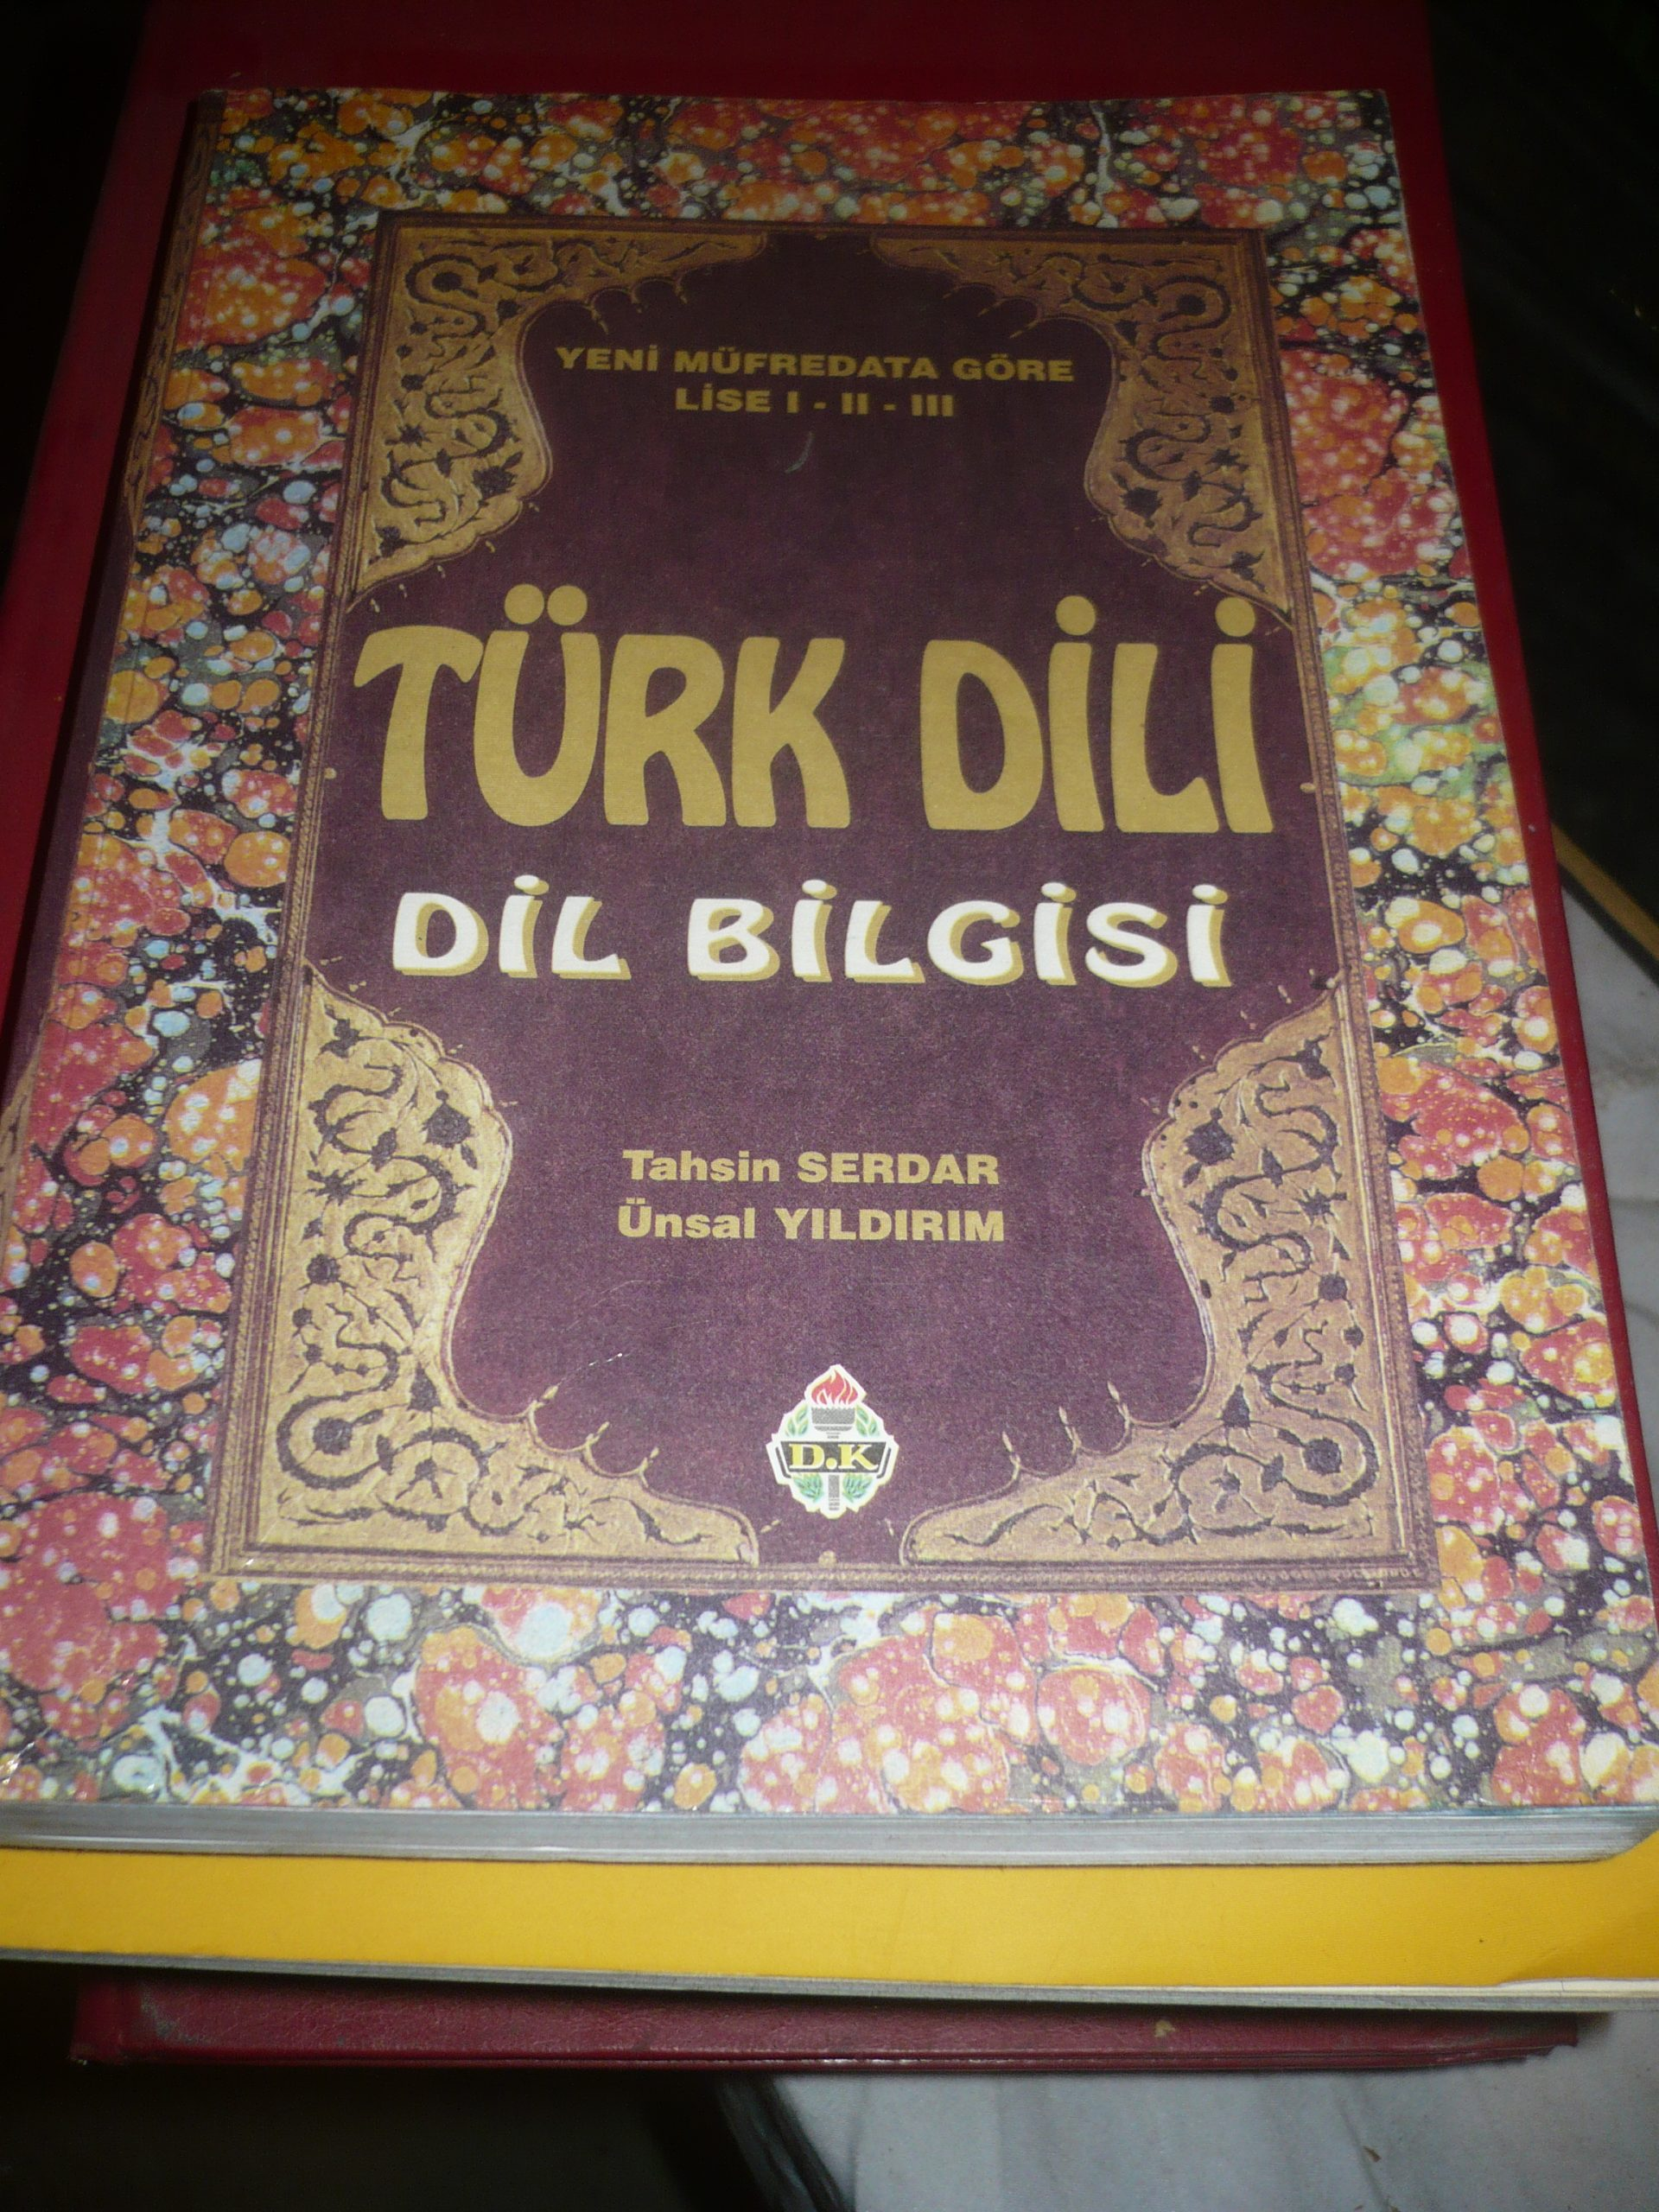 TÜRK DİLİ  -DİL BİLGİSİ/Tahsin SERDAR-Ünsal YILDIRIM/ 20 TL